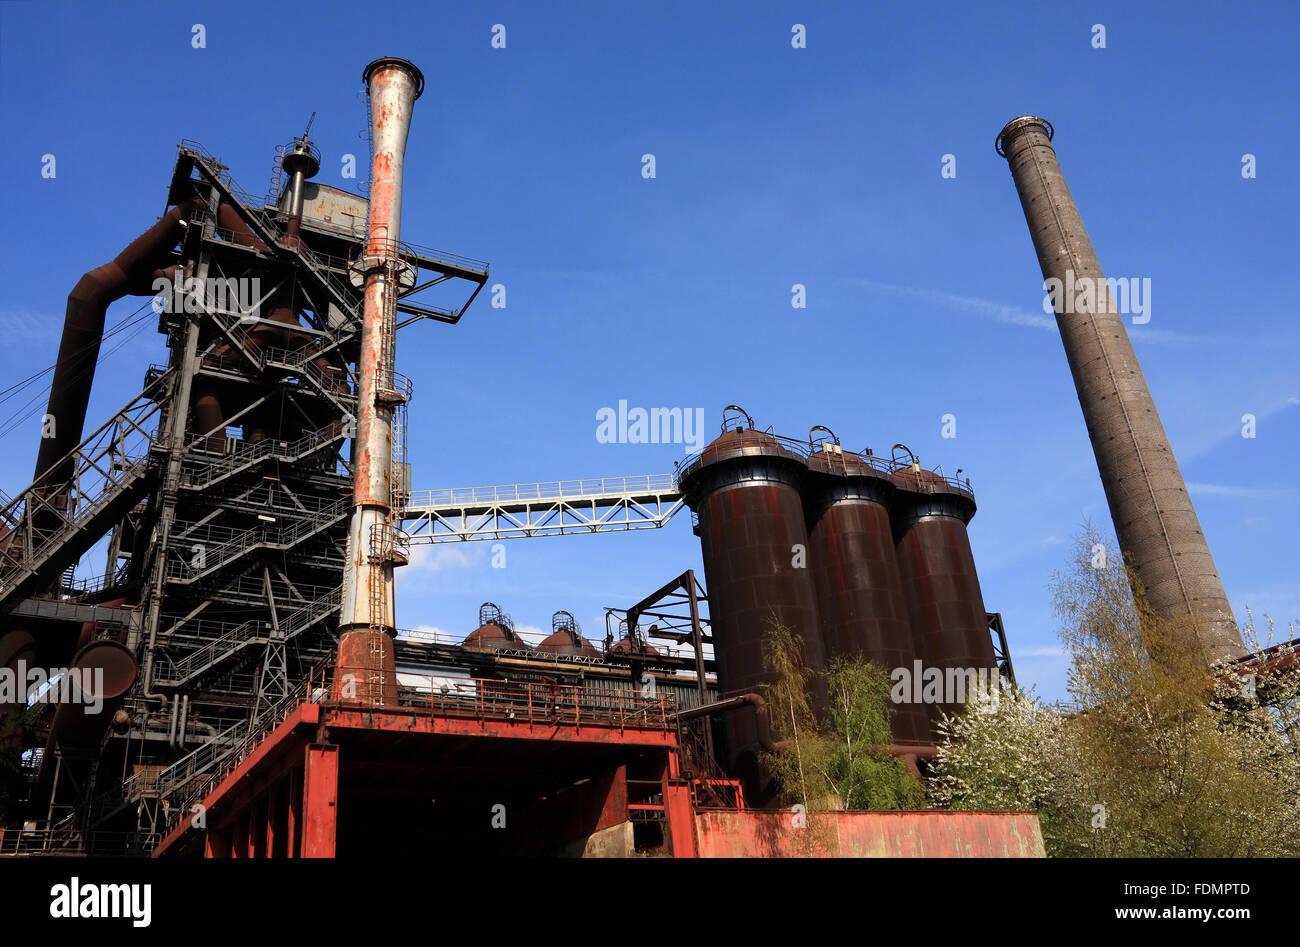 industry,industrial building,blast,industrial monuments,industrial heritage,landschaftspark duisburg nord,ironworks - Stock Image